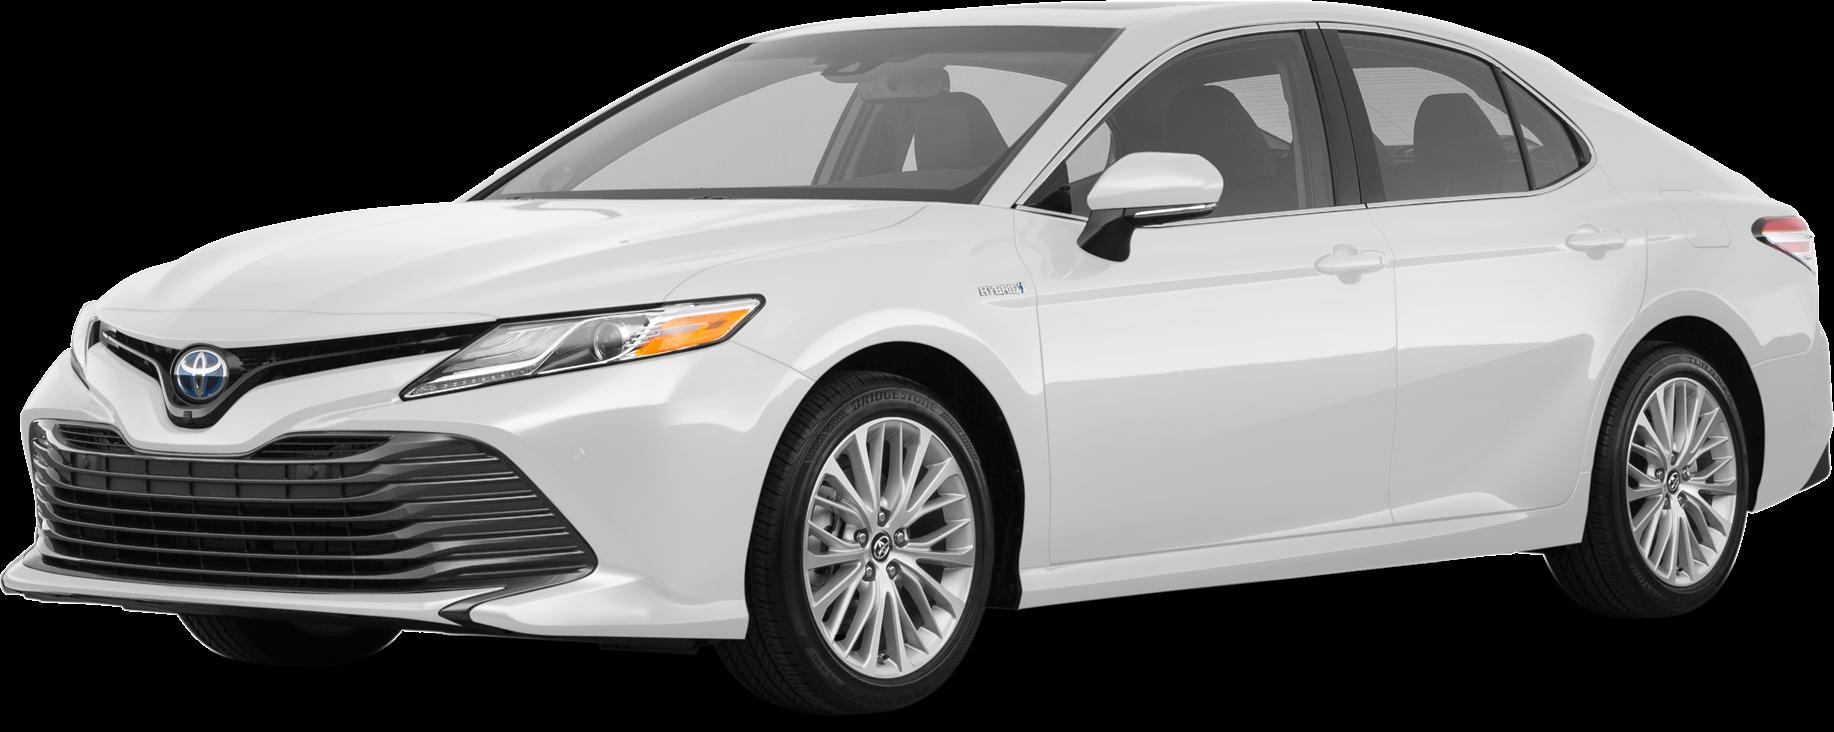 2009 Honda Accord | Pricing, Ratings, Expert Review | Kelley